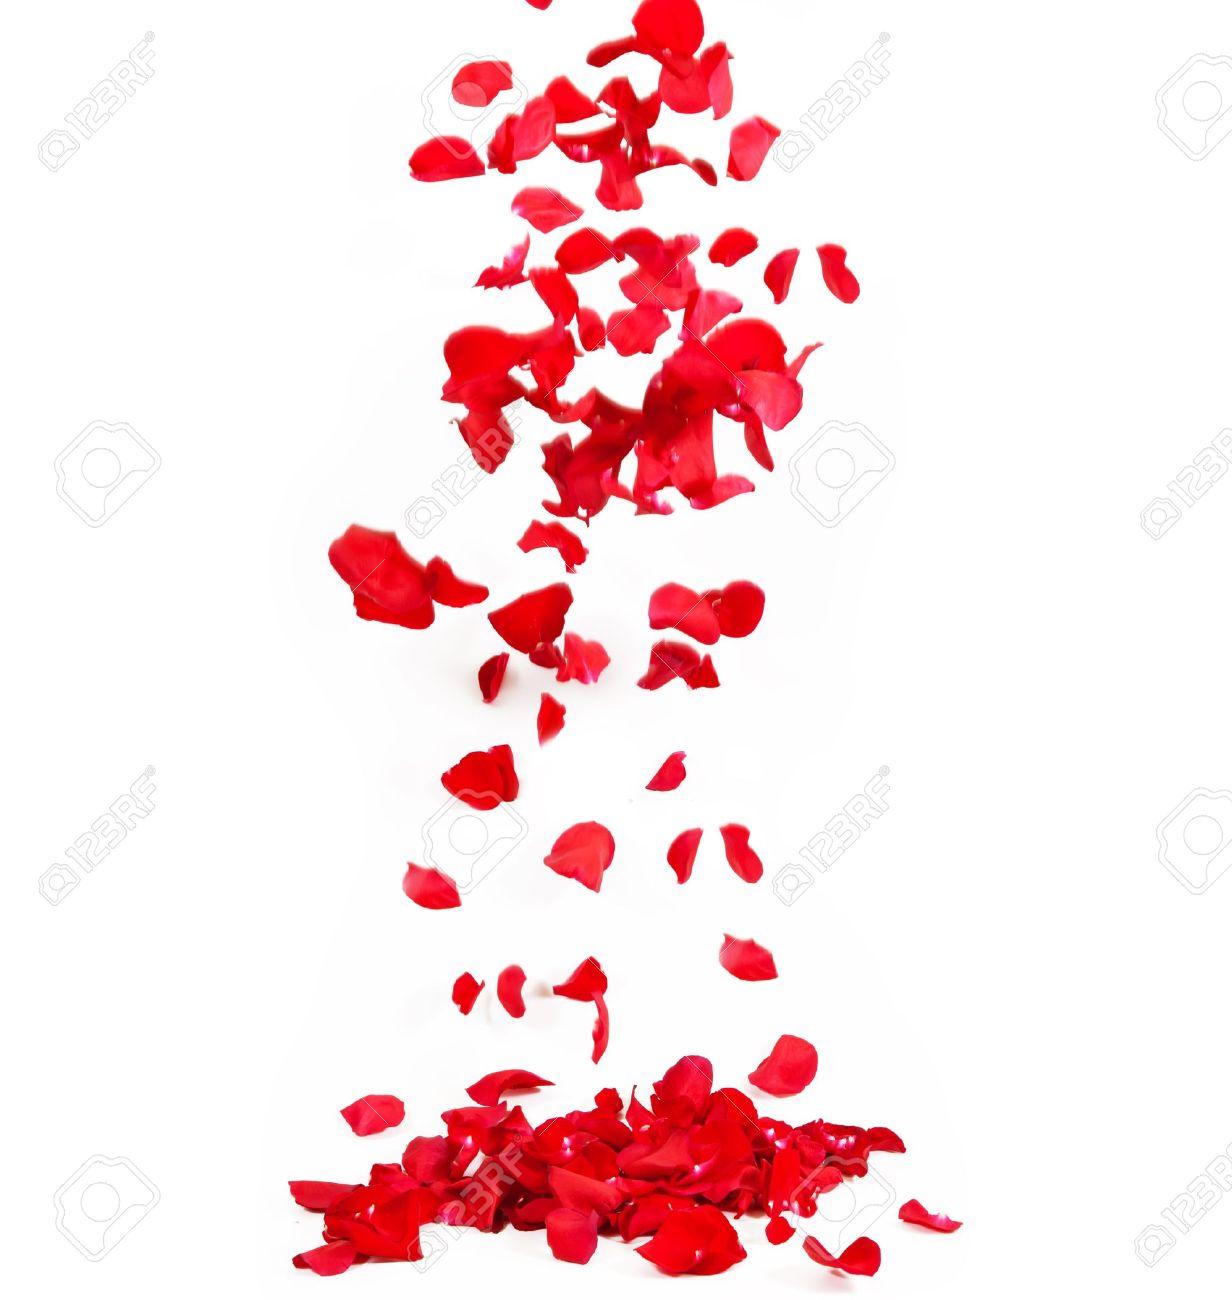 Falling petals of roses - 18513936